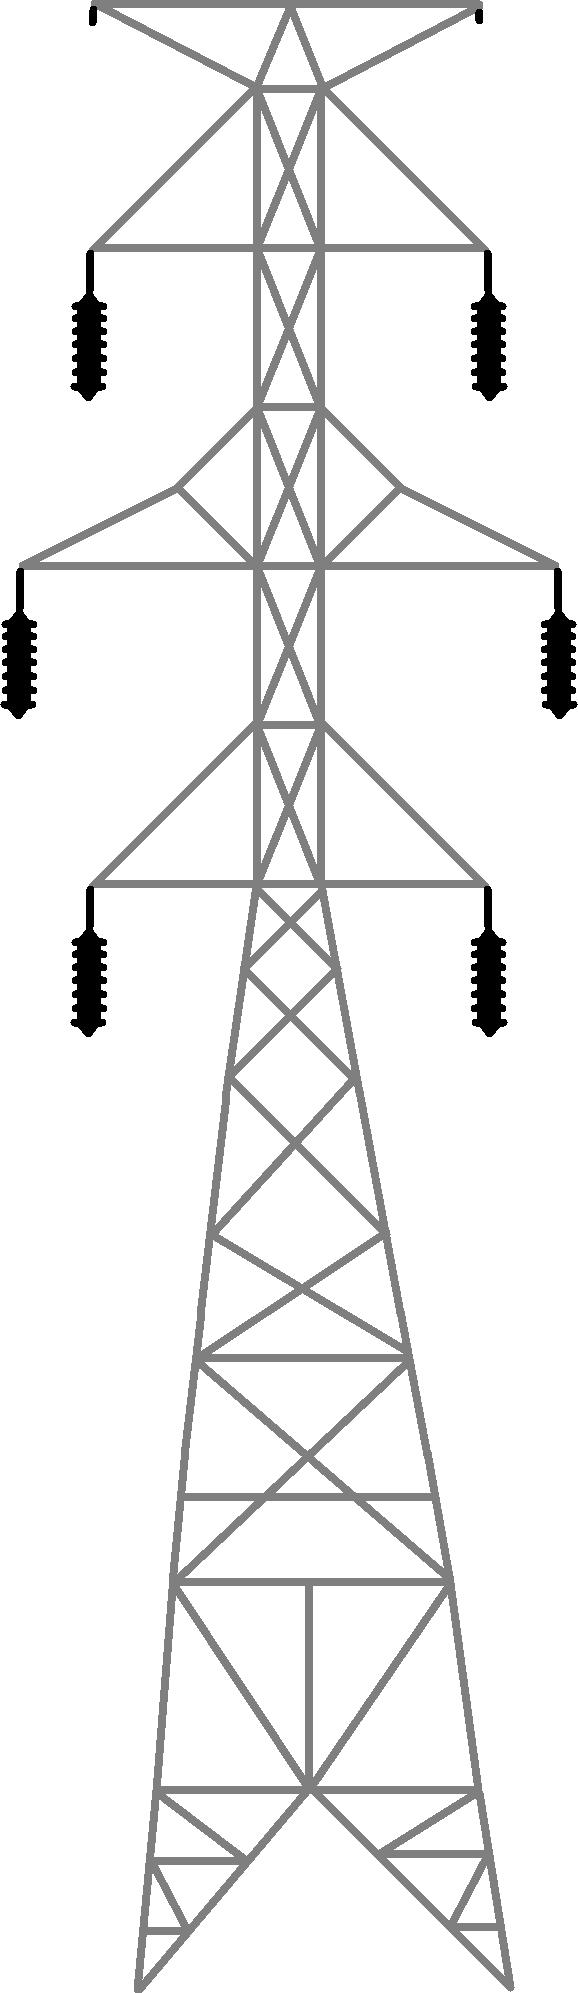 Electrical Tower Torre De Energia Energia Electrica Ingenieria Electrica